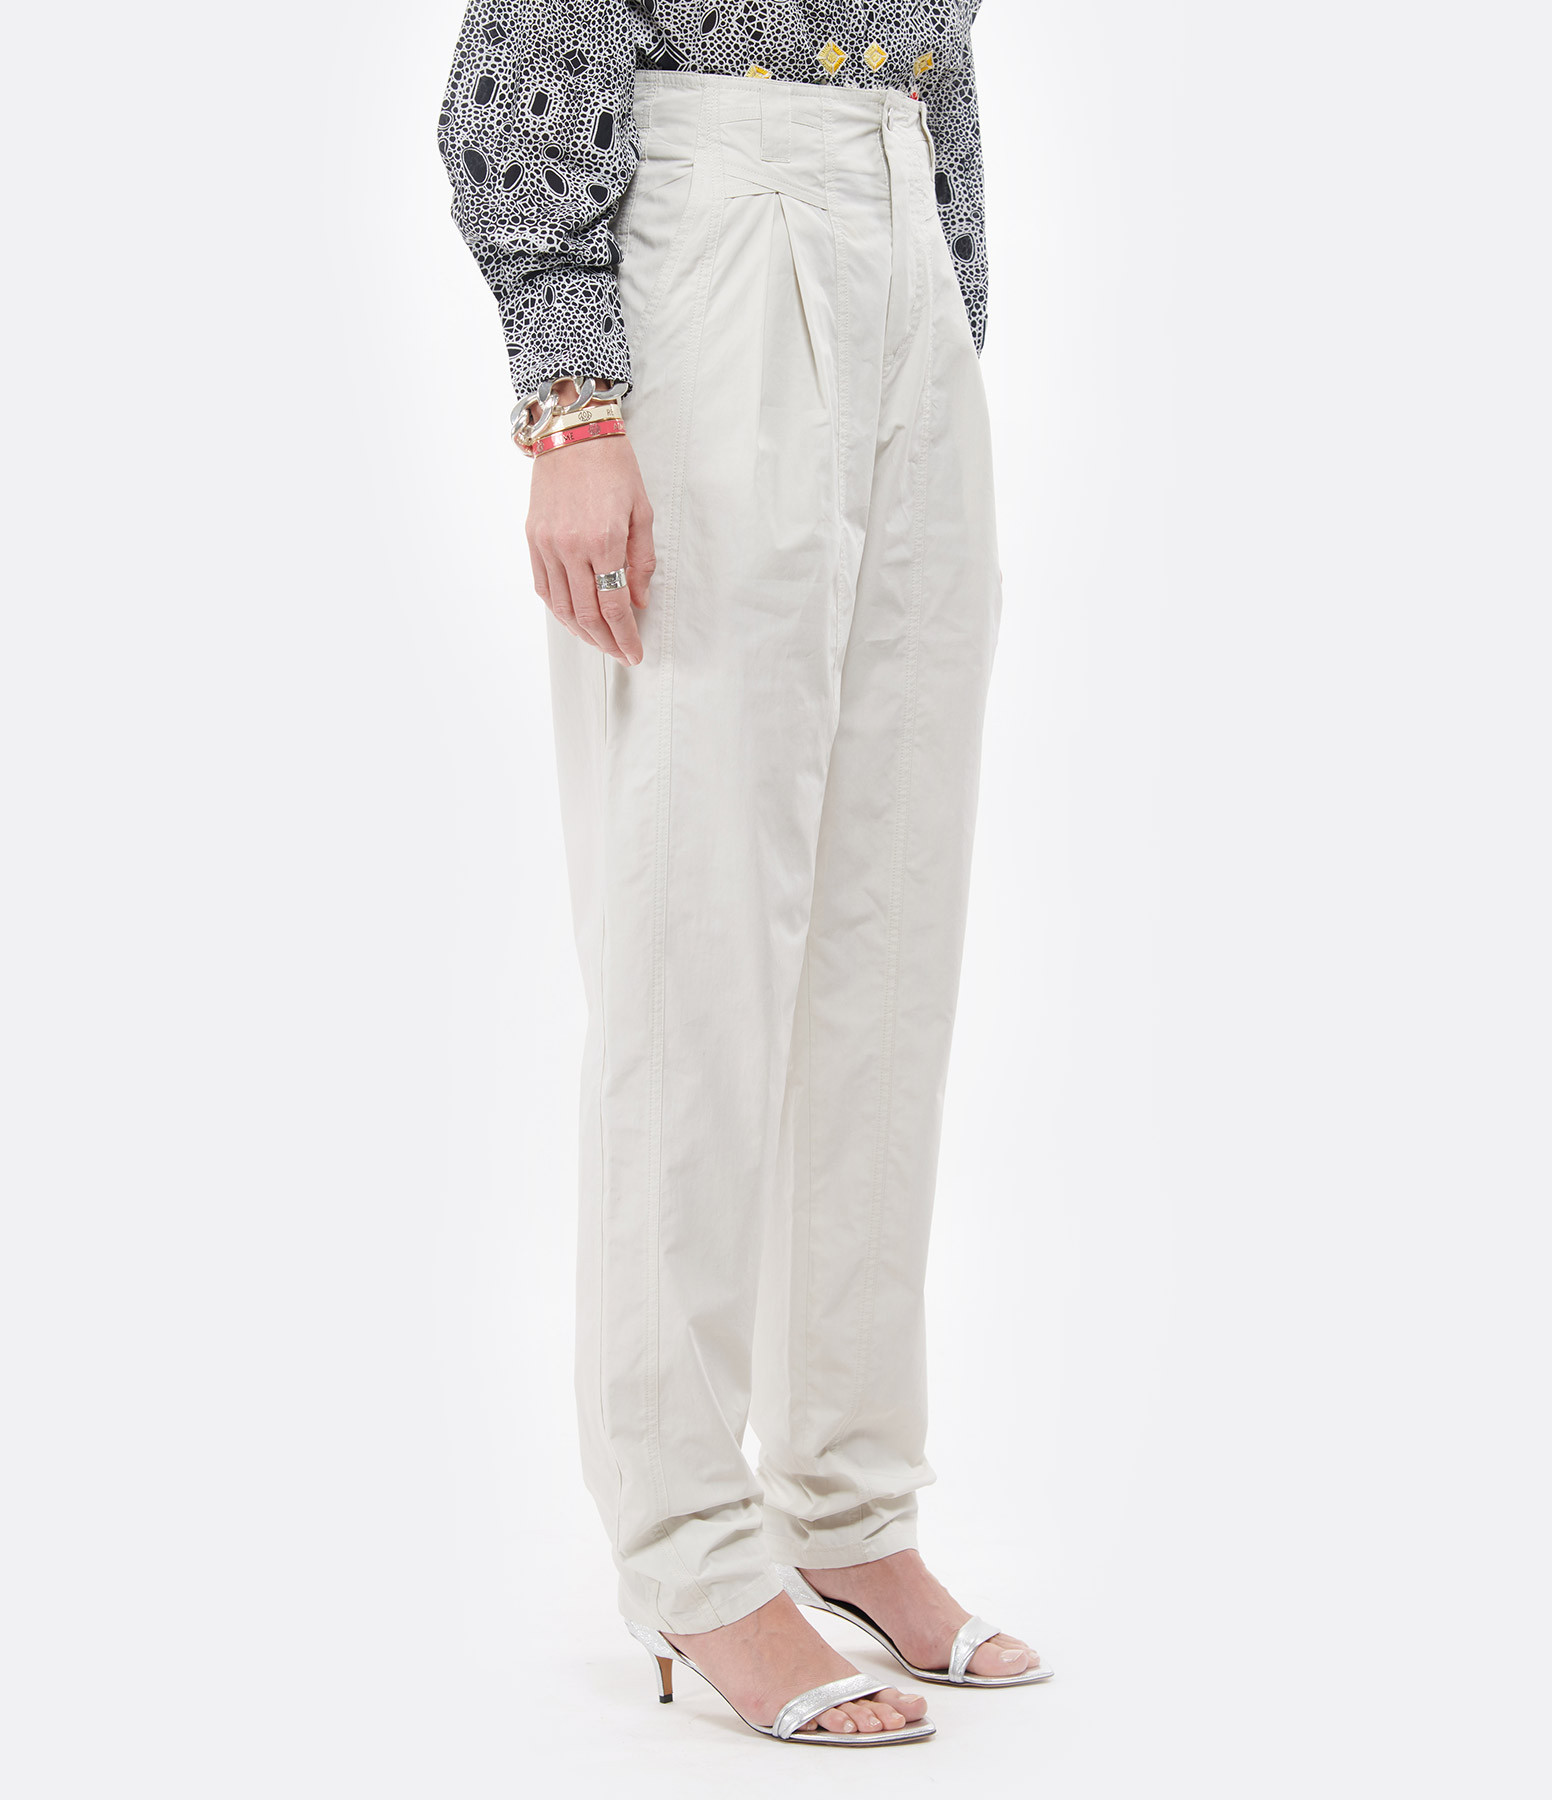 ISABEL MARANT - Pantalon Kilandy Coton Craie